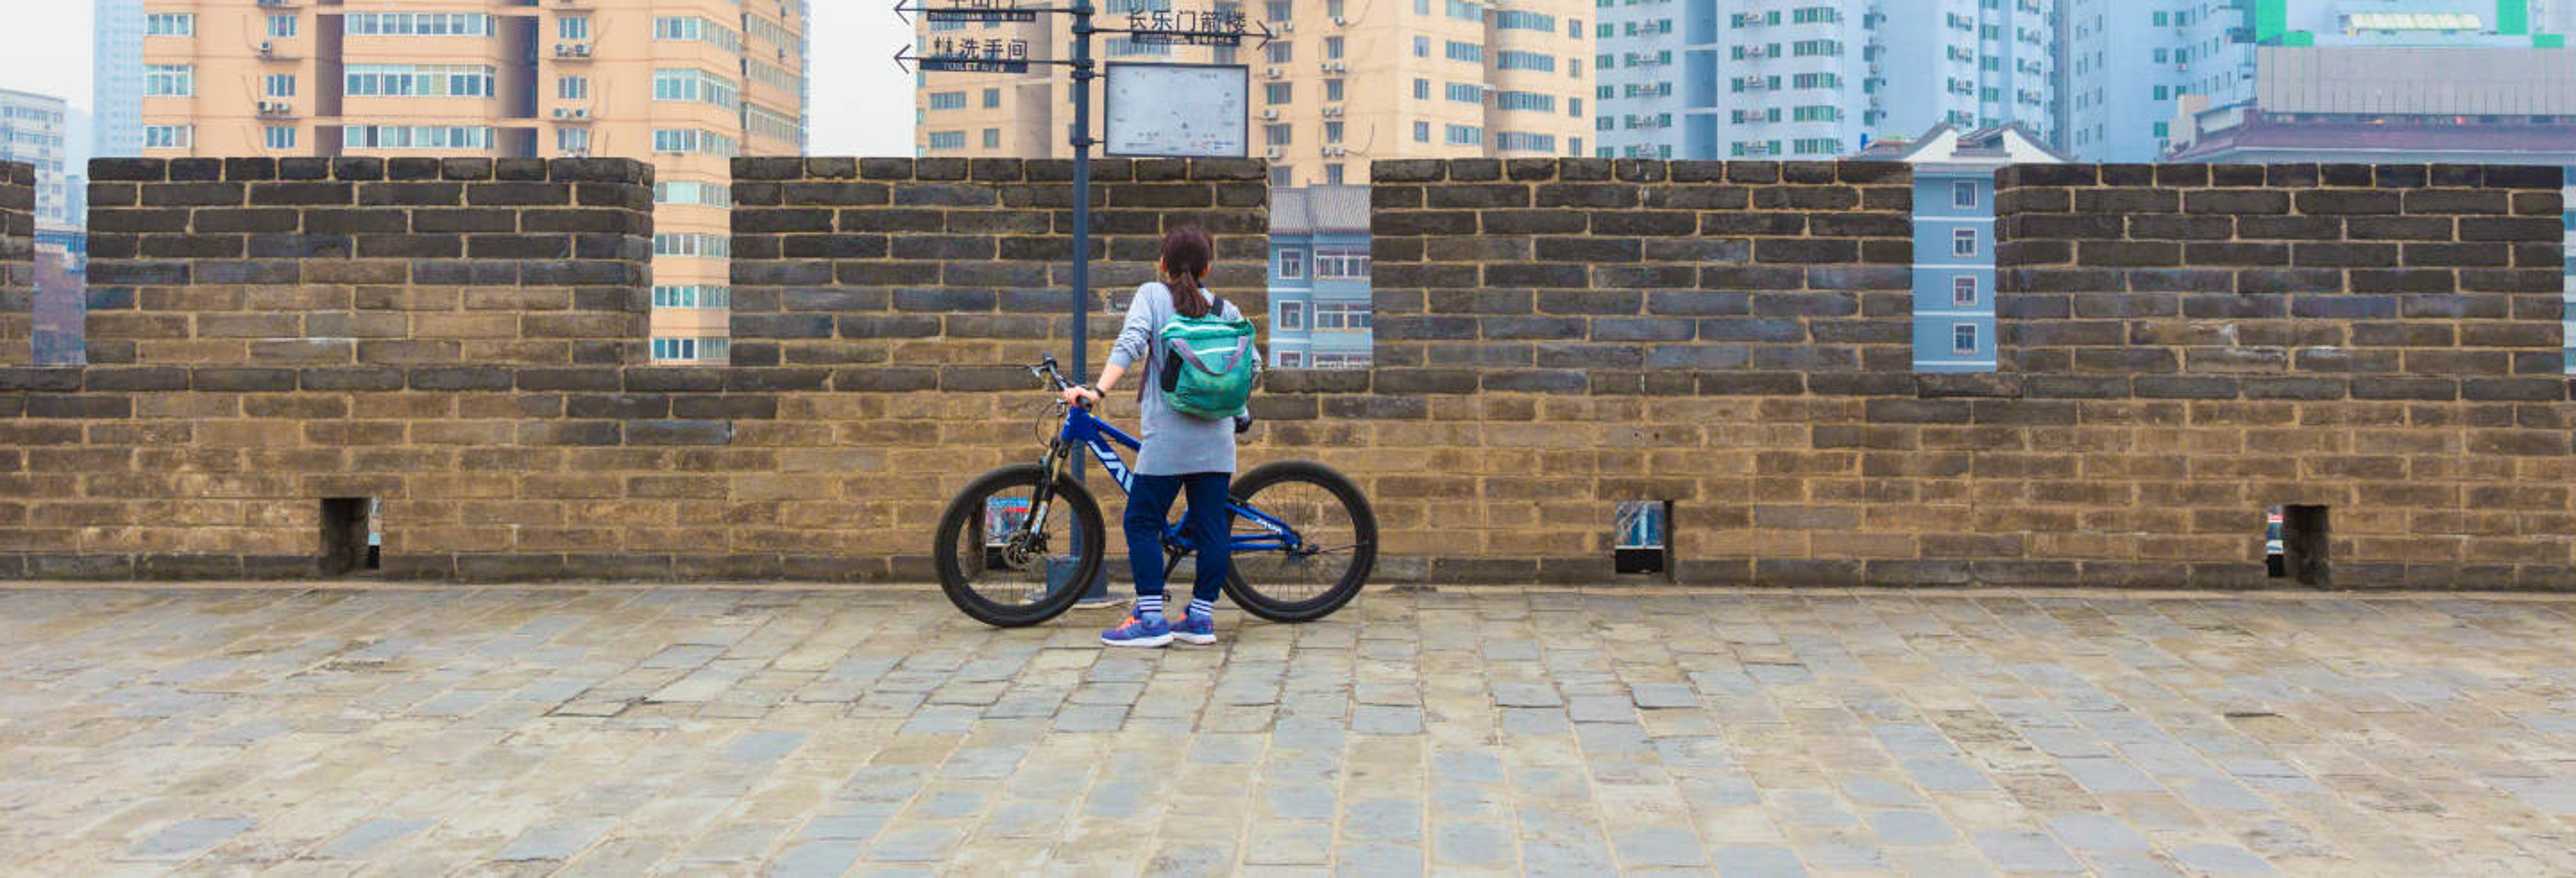 Tour en bicicleta por la muralla de Xián